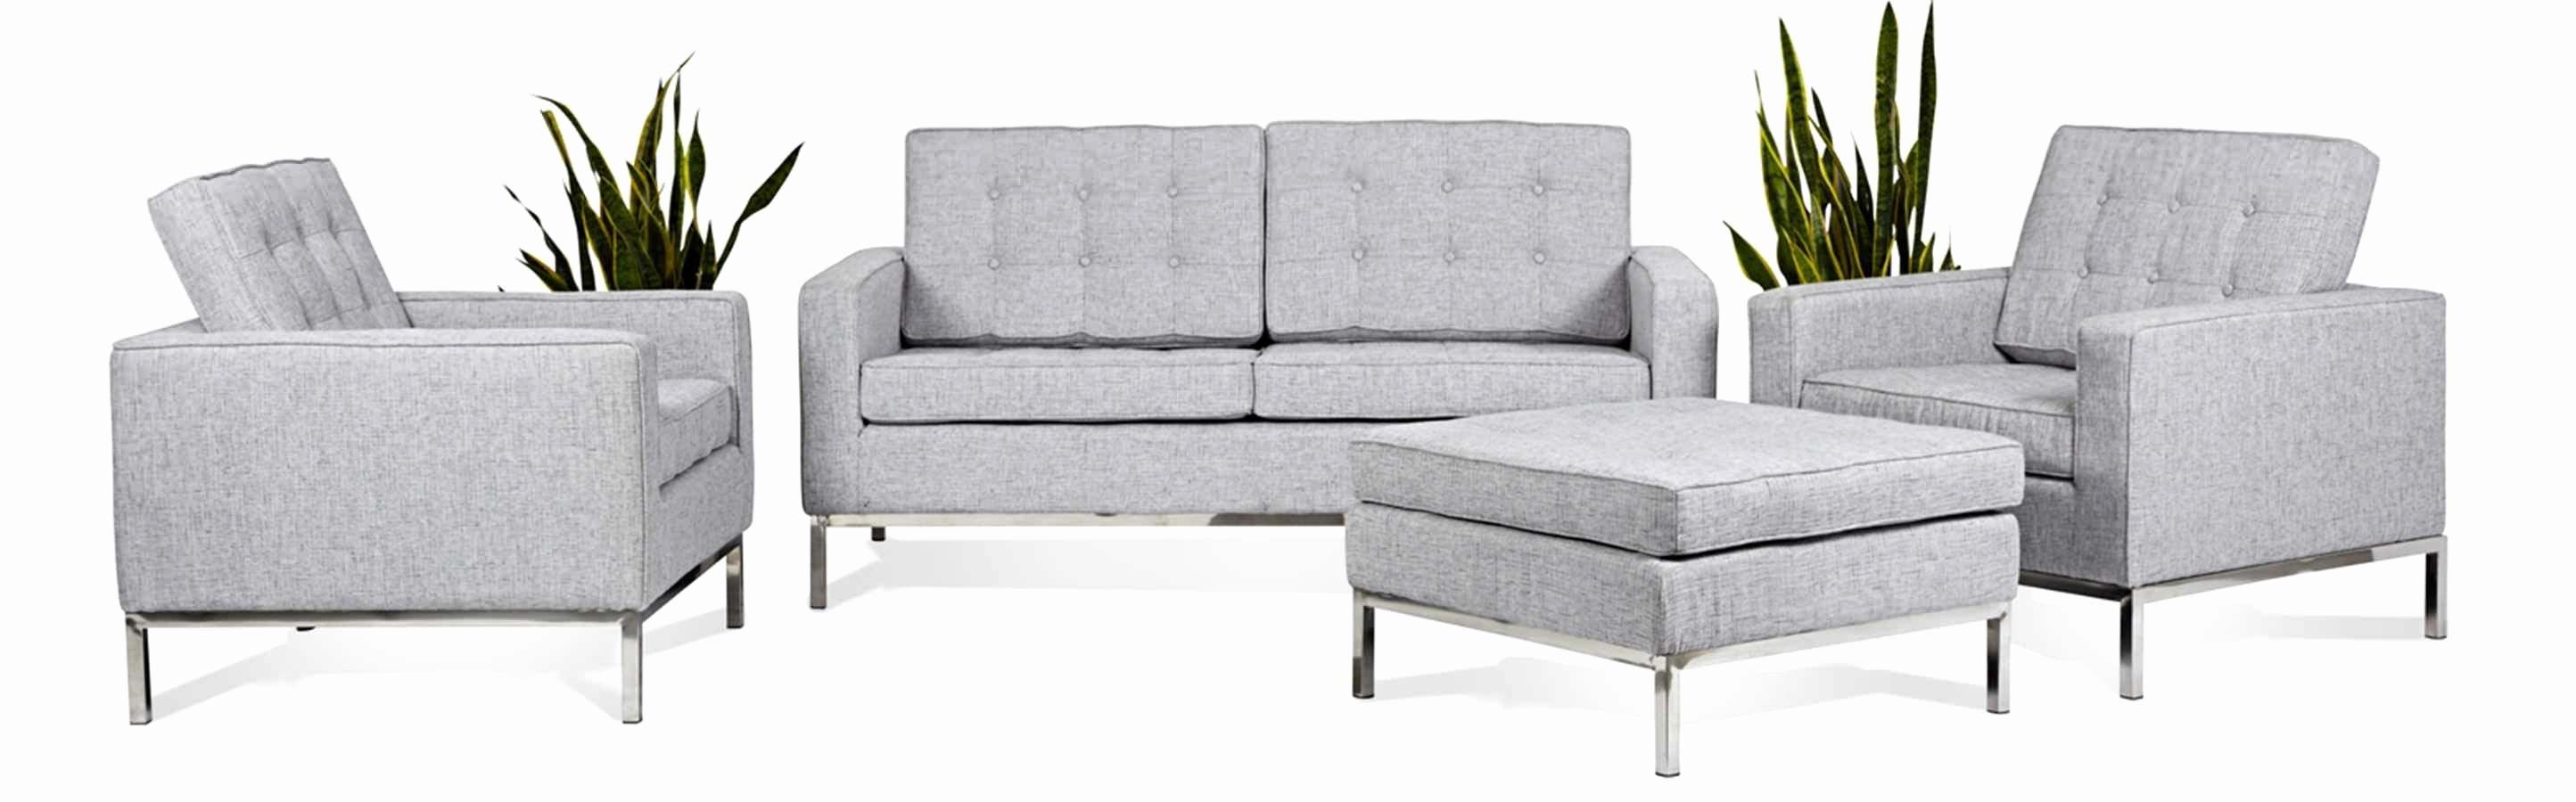 New Retro Modern sofa Pictures retro modern furniture uv ...